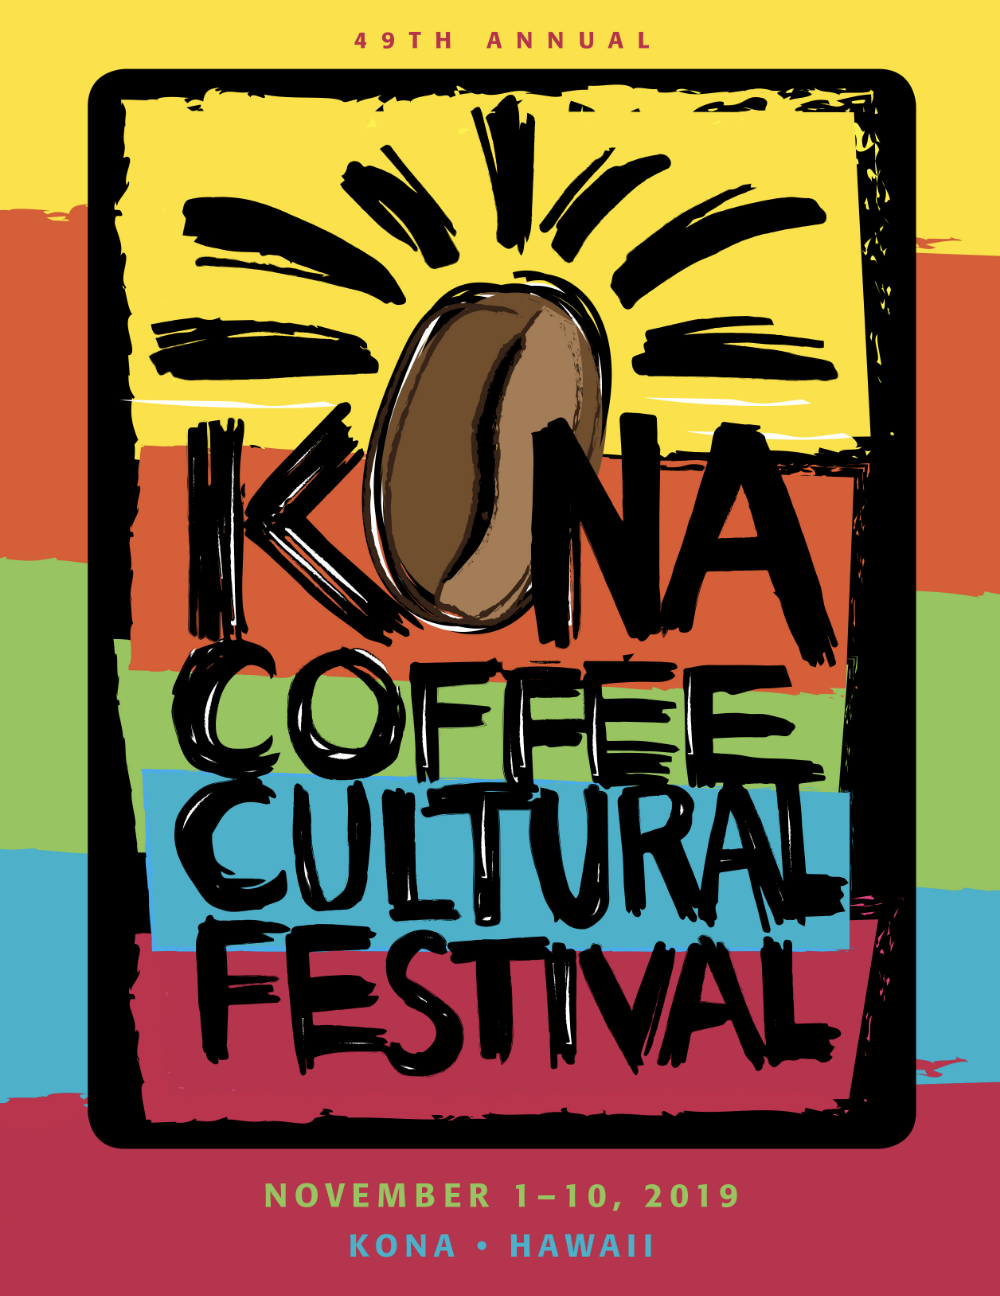 Kona Coffee Festival events 2019